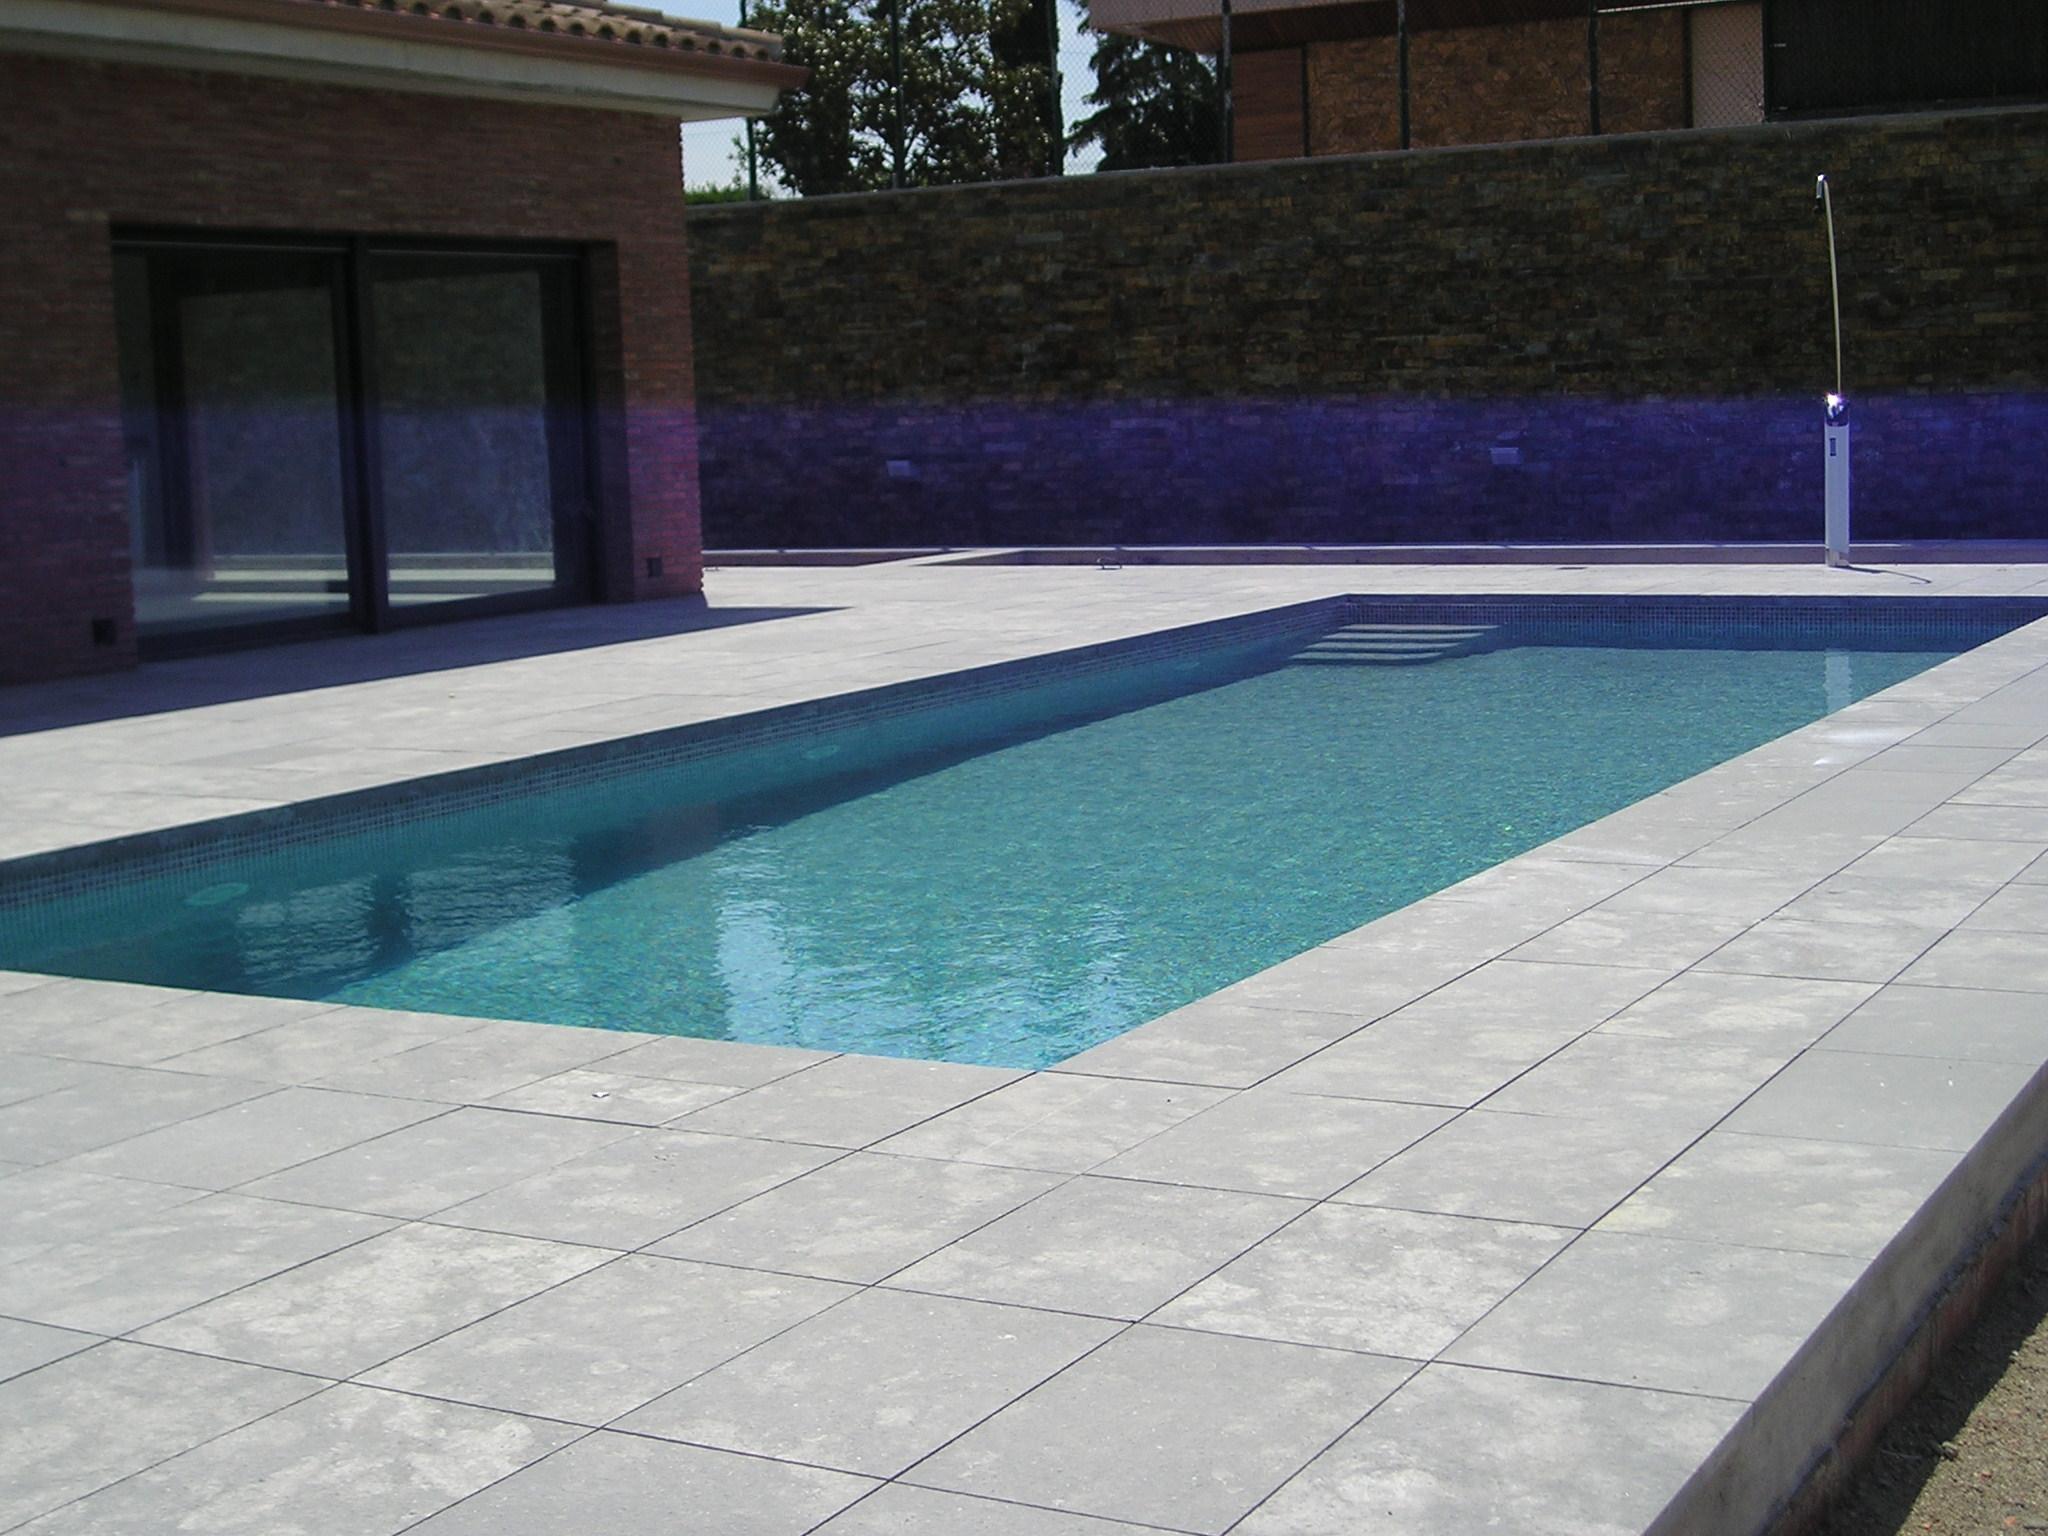 Fotos de piscinas unic pictures - Fotos de piscina ...